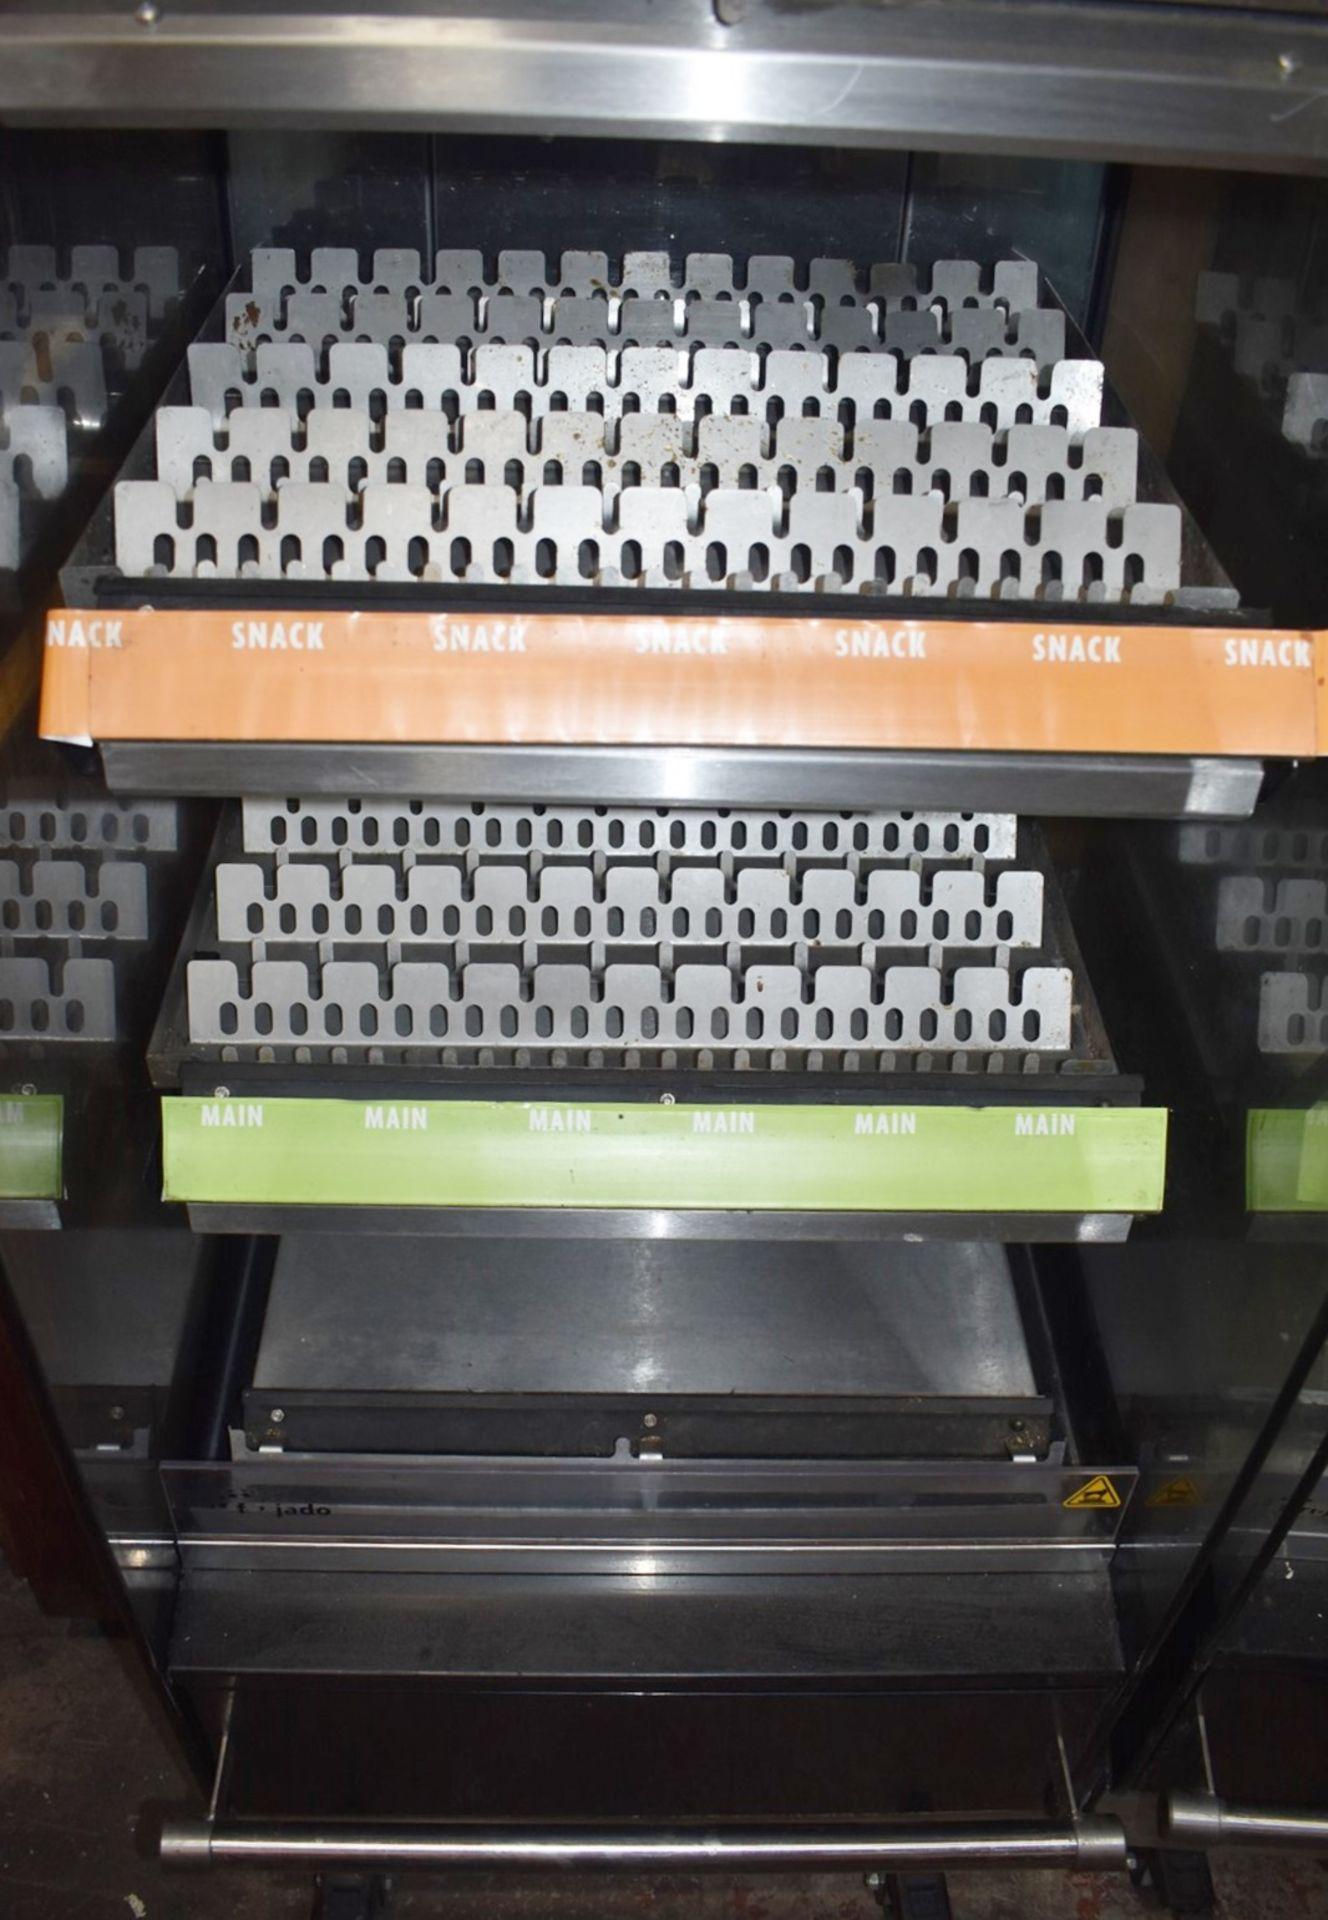 1 x Frijado Multi Deck 60 5 Level Heated Grab and Go Display Warmer - 400v 3 Phase - H197 x W60 x - Image 2 of 7